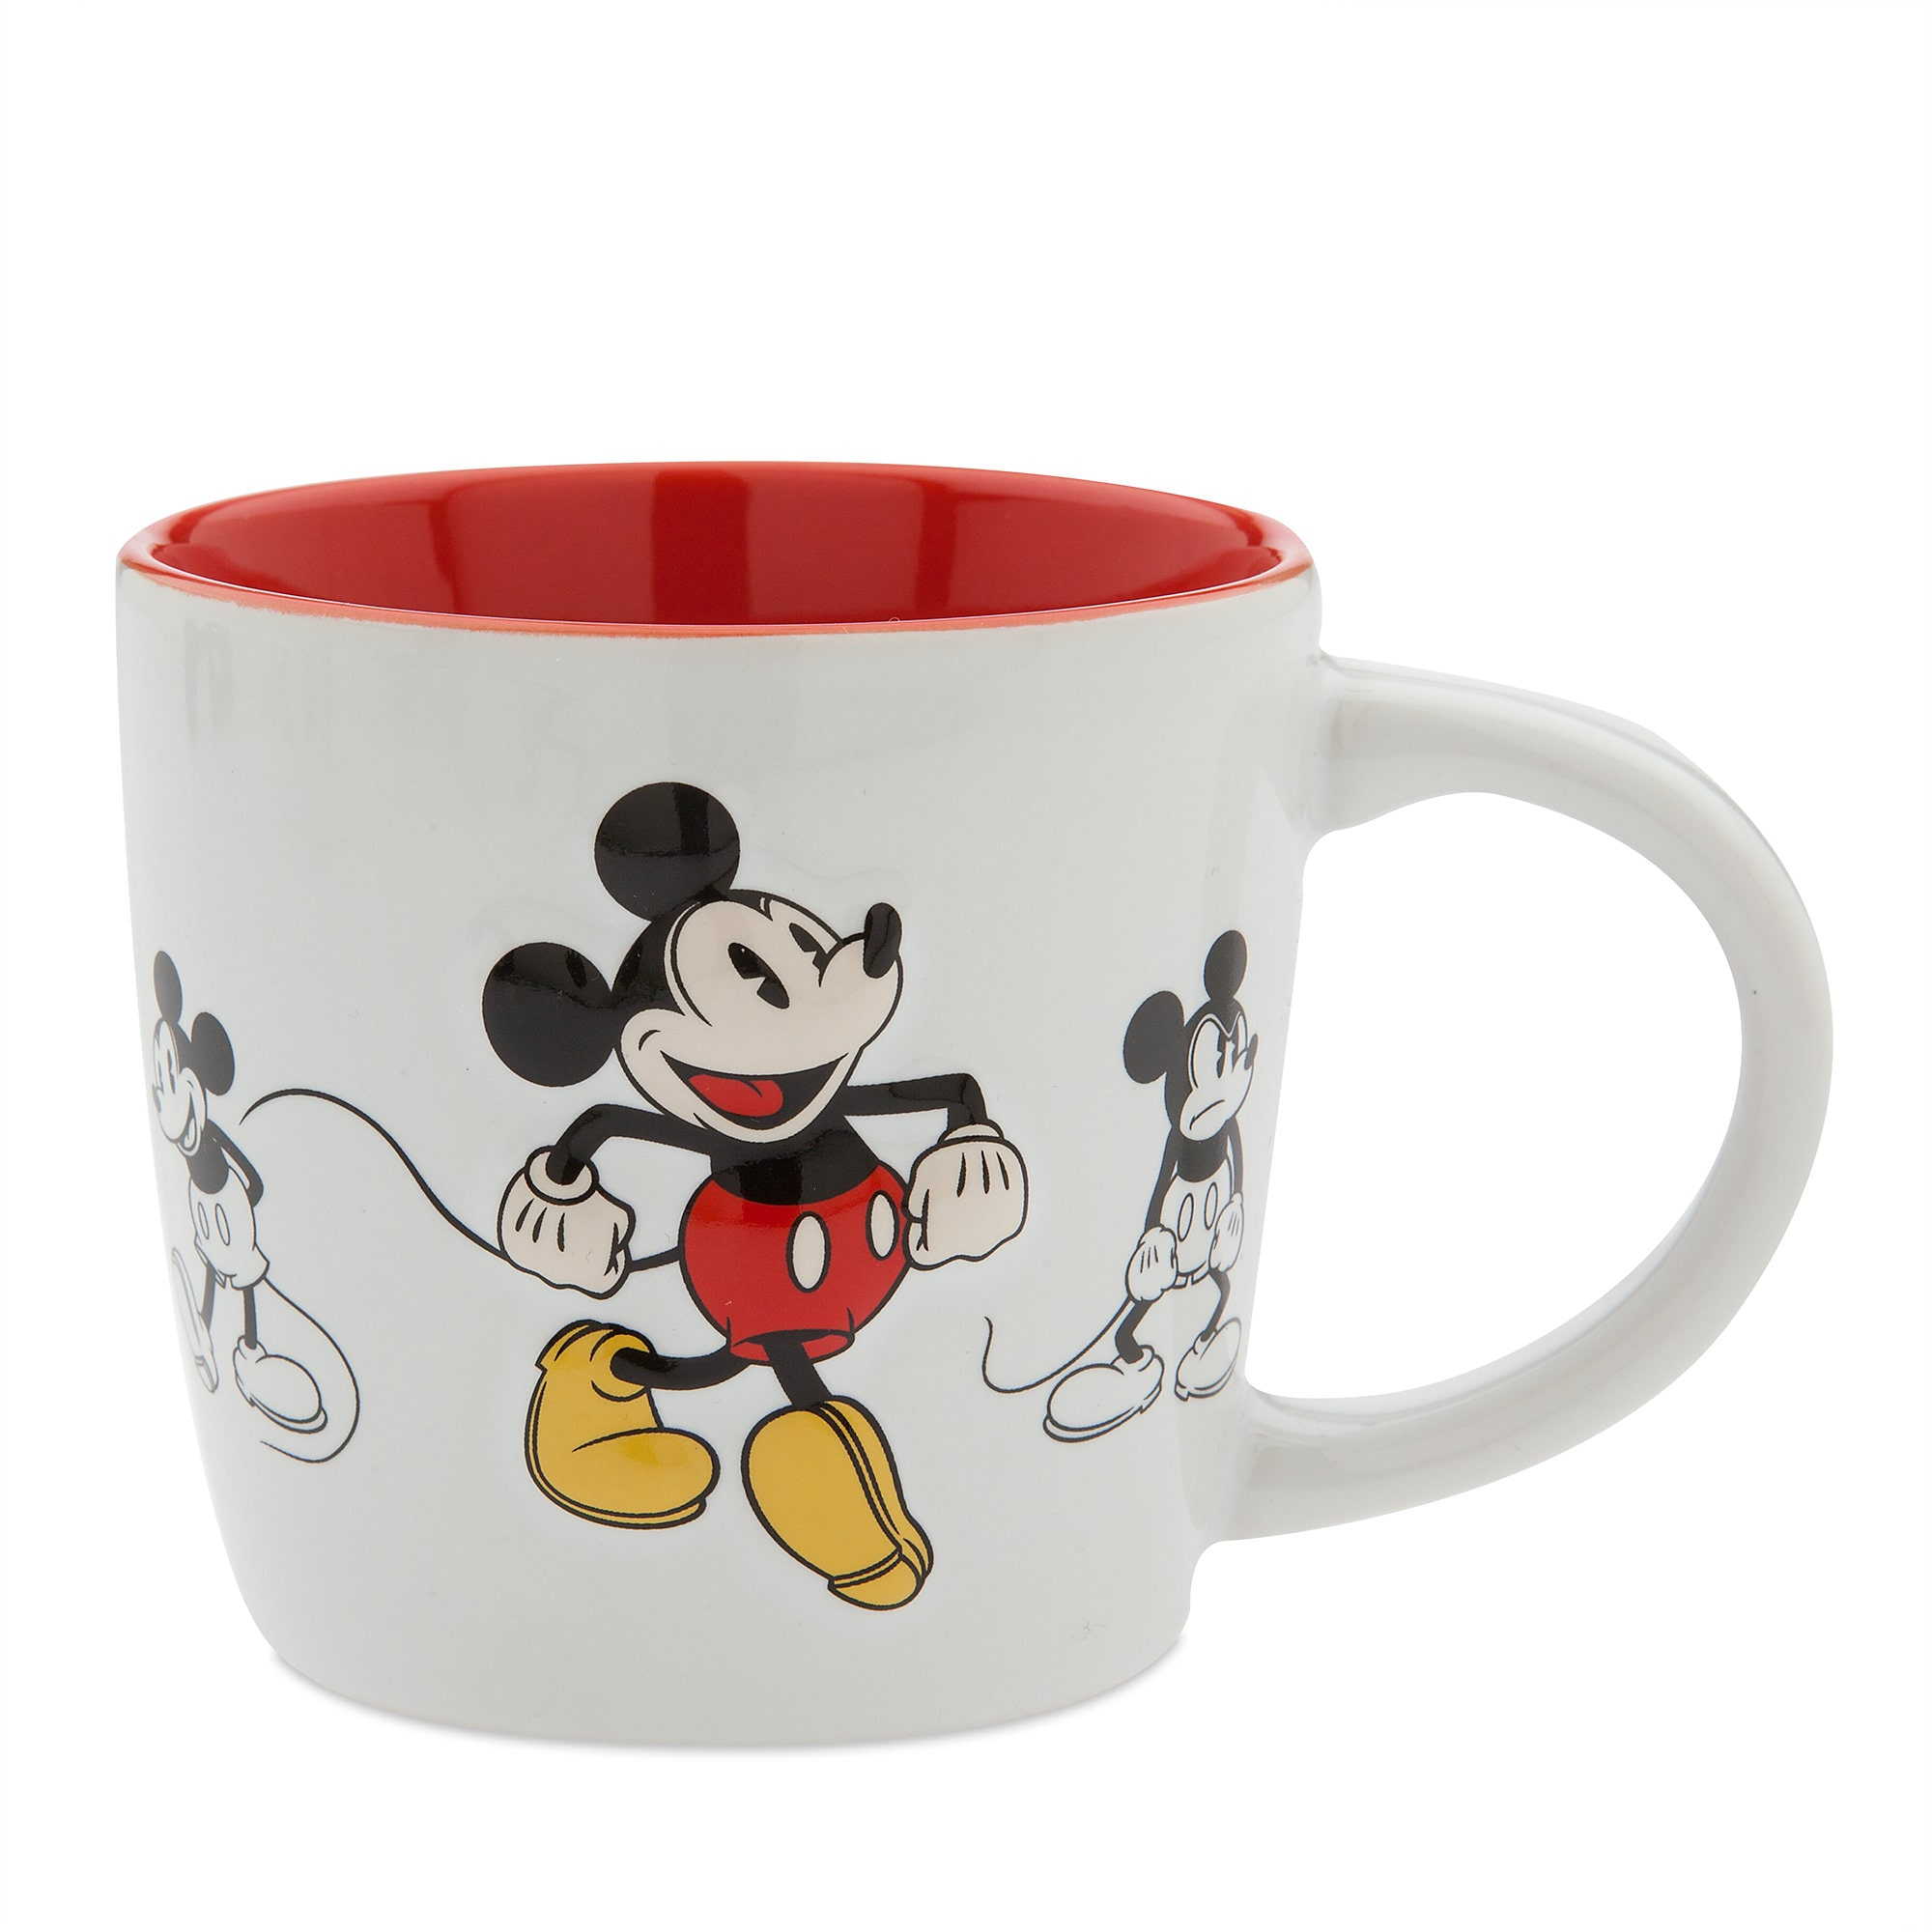 Mickey Mouse Decal Mug  shopDisney